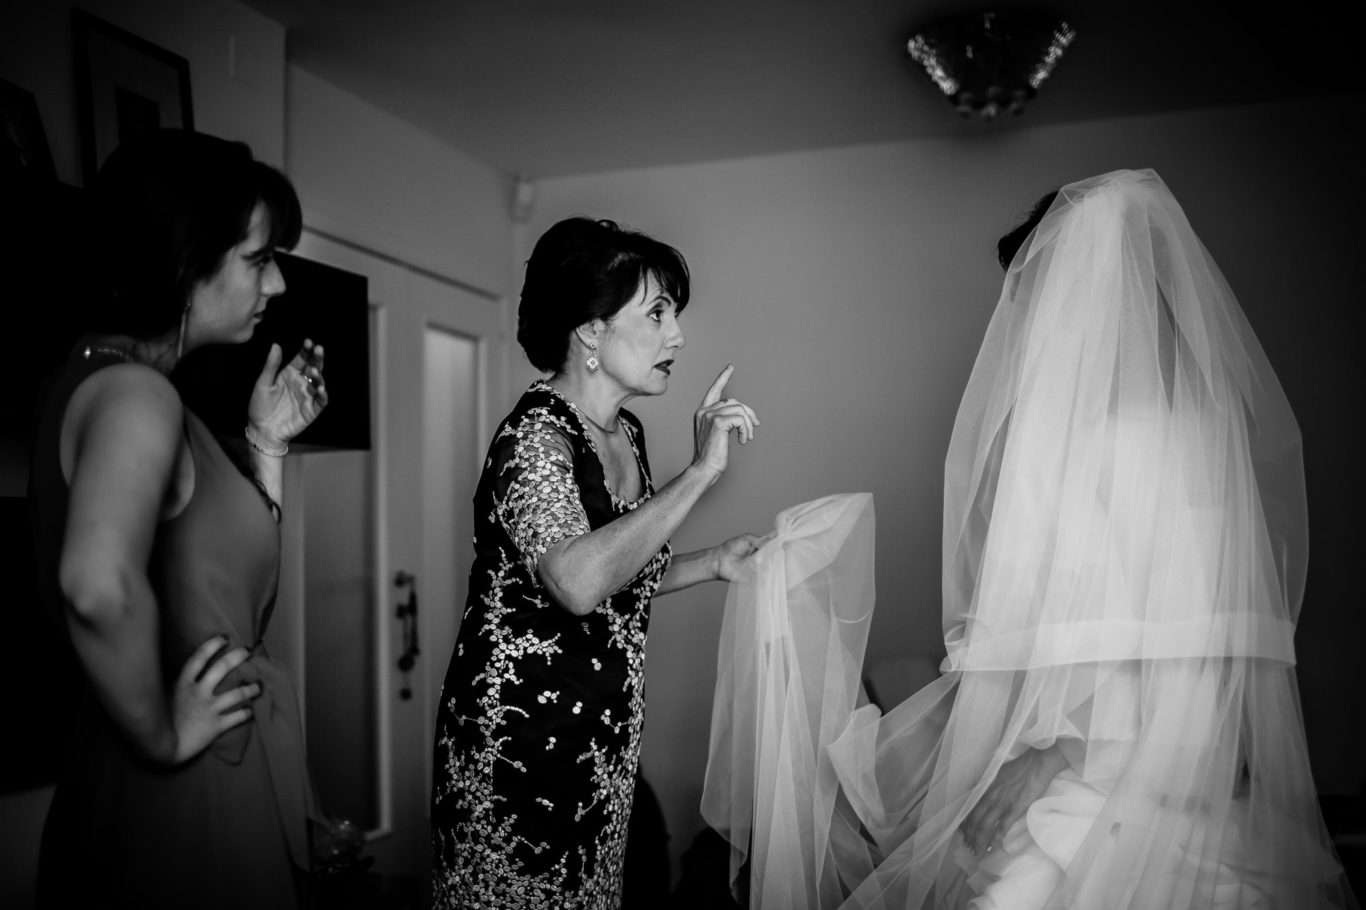 0158-Fotografie-nunta-Simona-Valentin-fotograf-Ciprian-Dumitrescu-CDF_8302